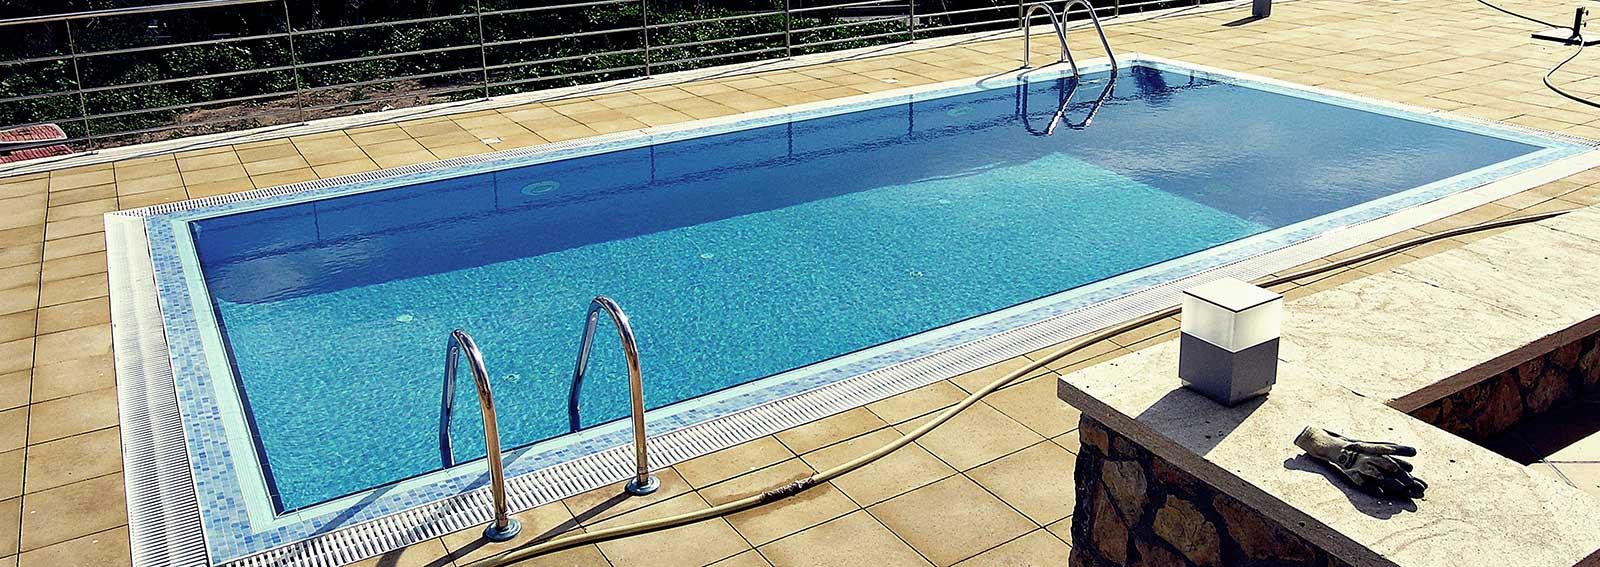 aguaviva-piscinas-sli-07